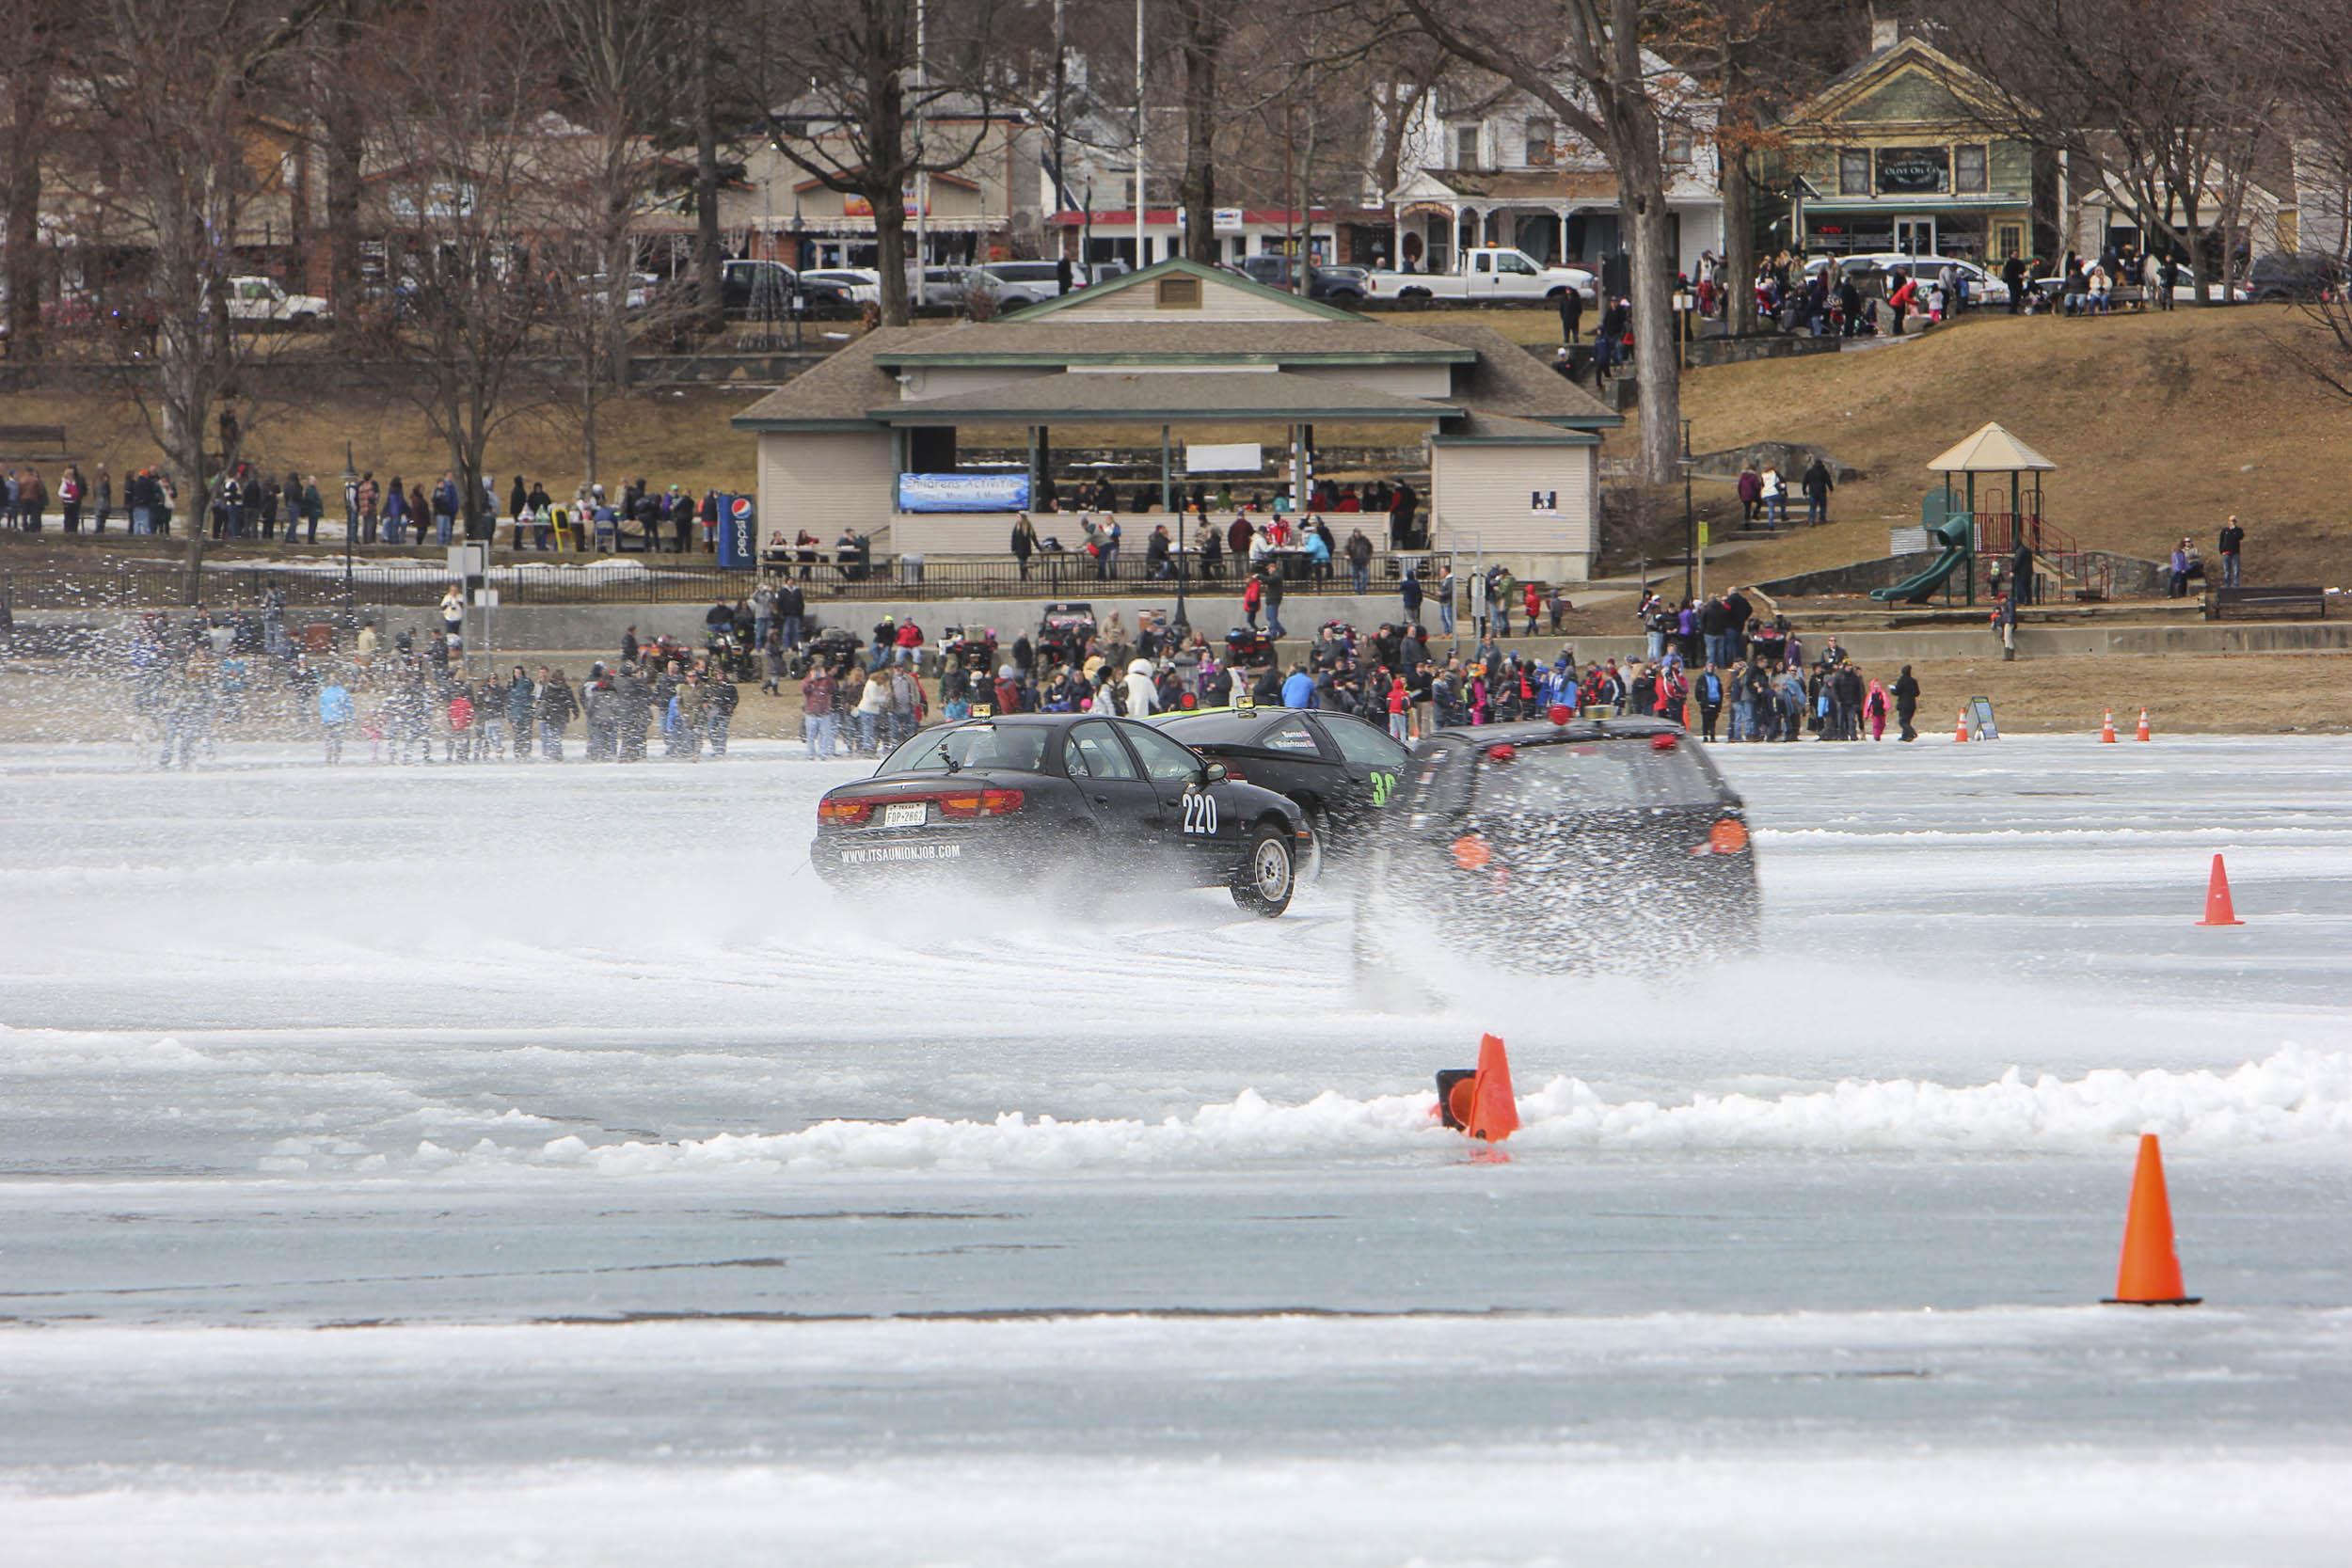 Ice racing event